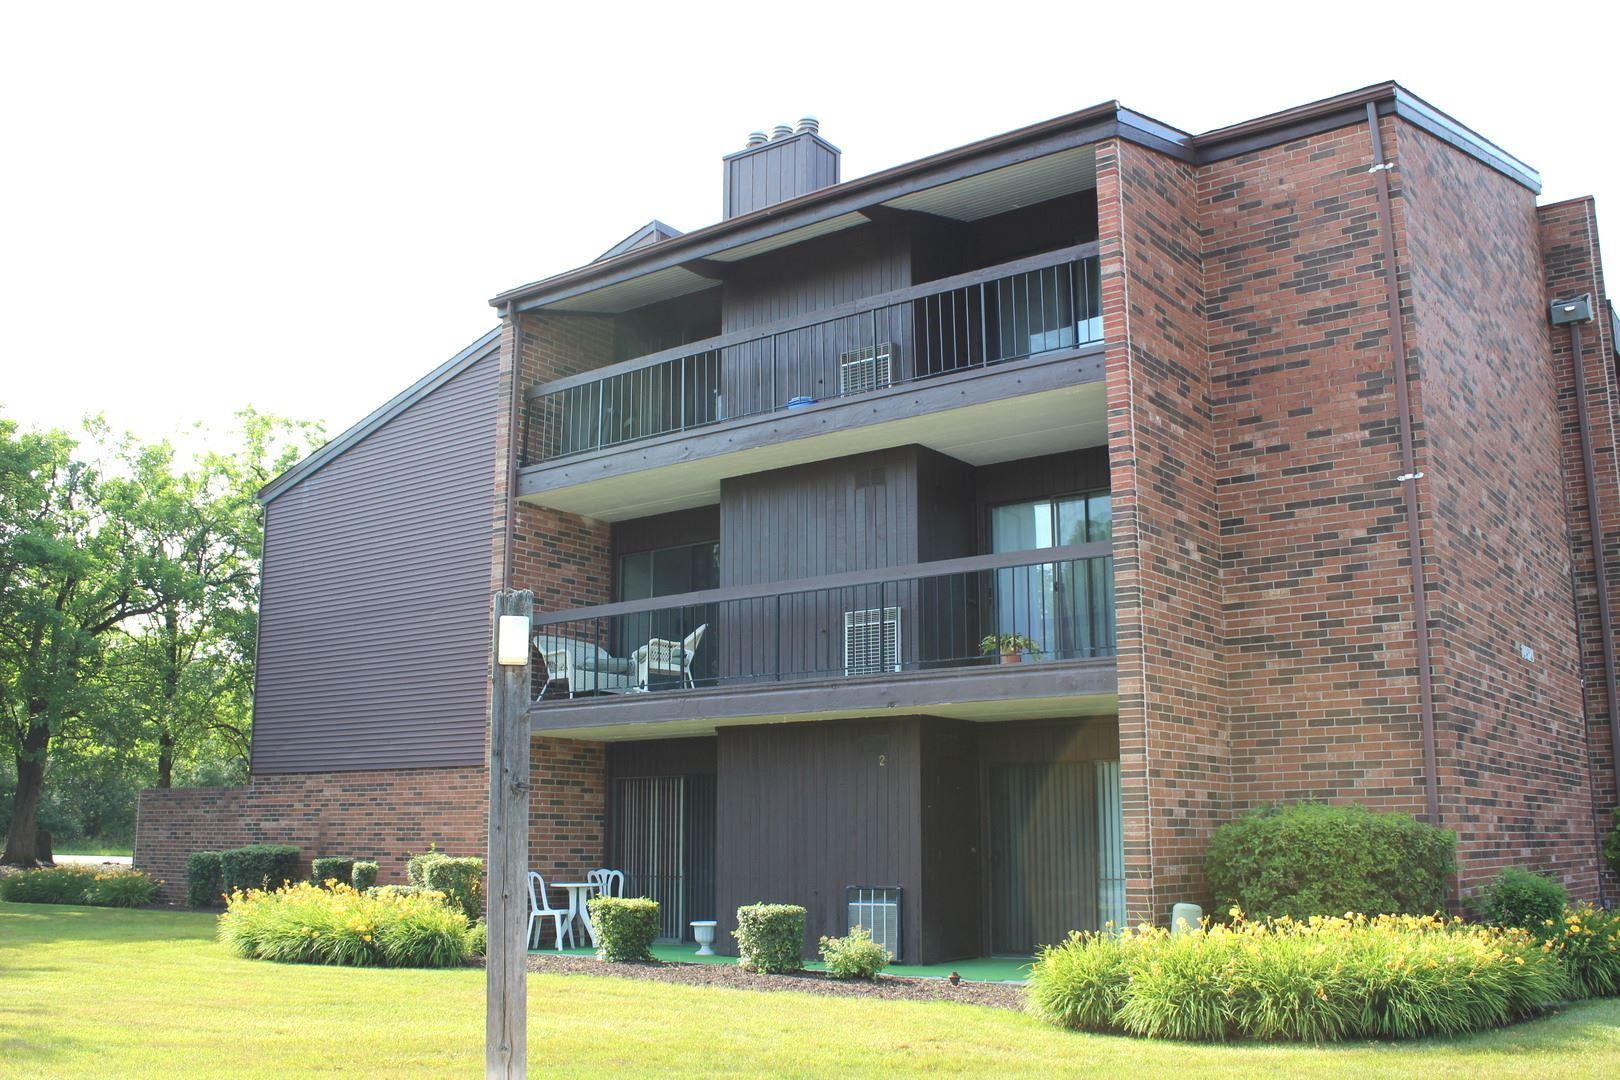 14524 WALDEN Court #G2, Oak Forest, IL 60452 - #: 10631837